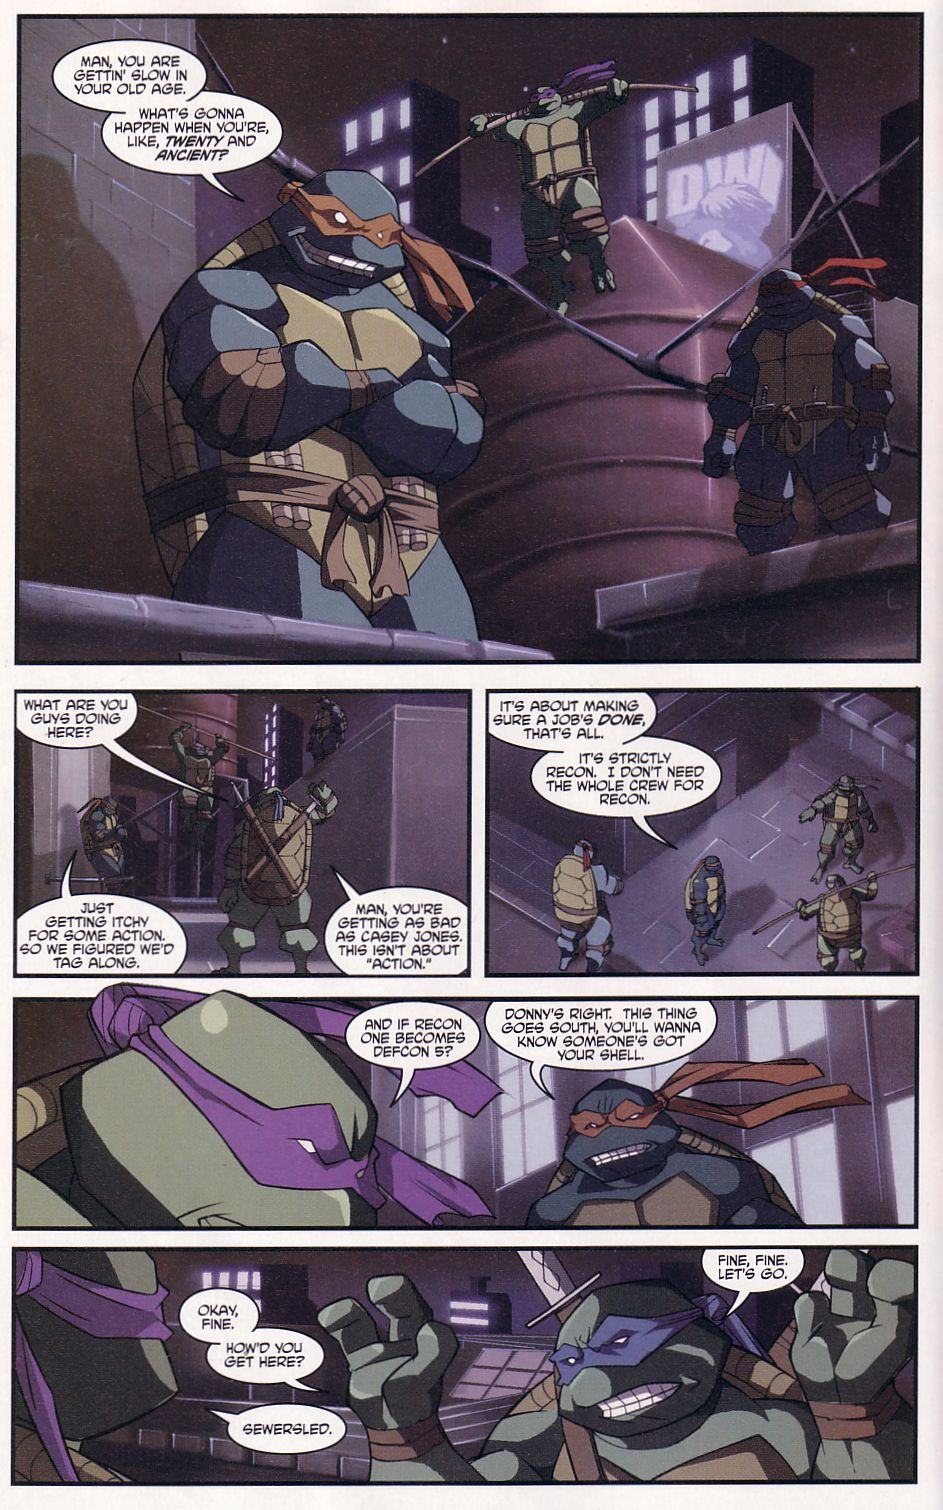 Teenage Mutant Ninja Turtles (2003) chap 7 pic 9